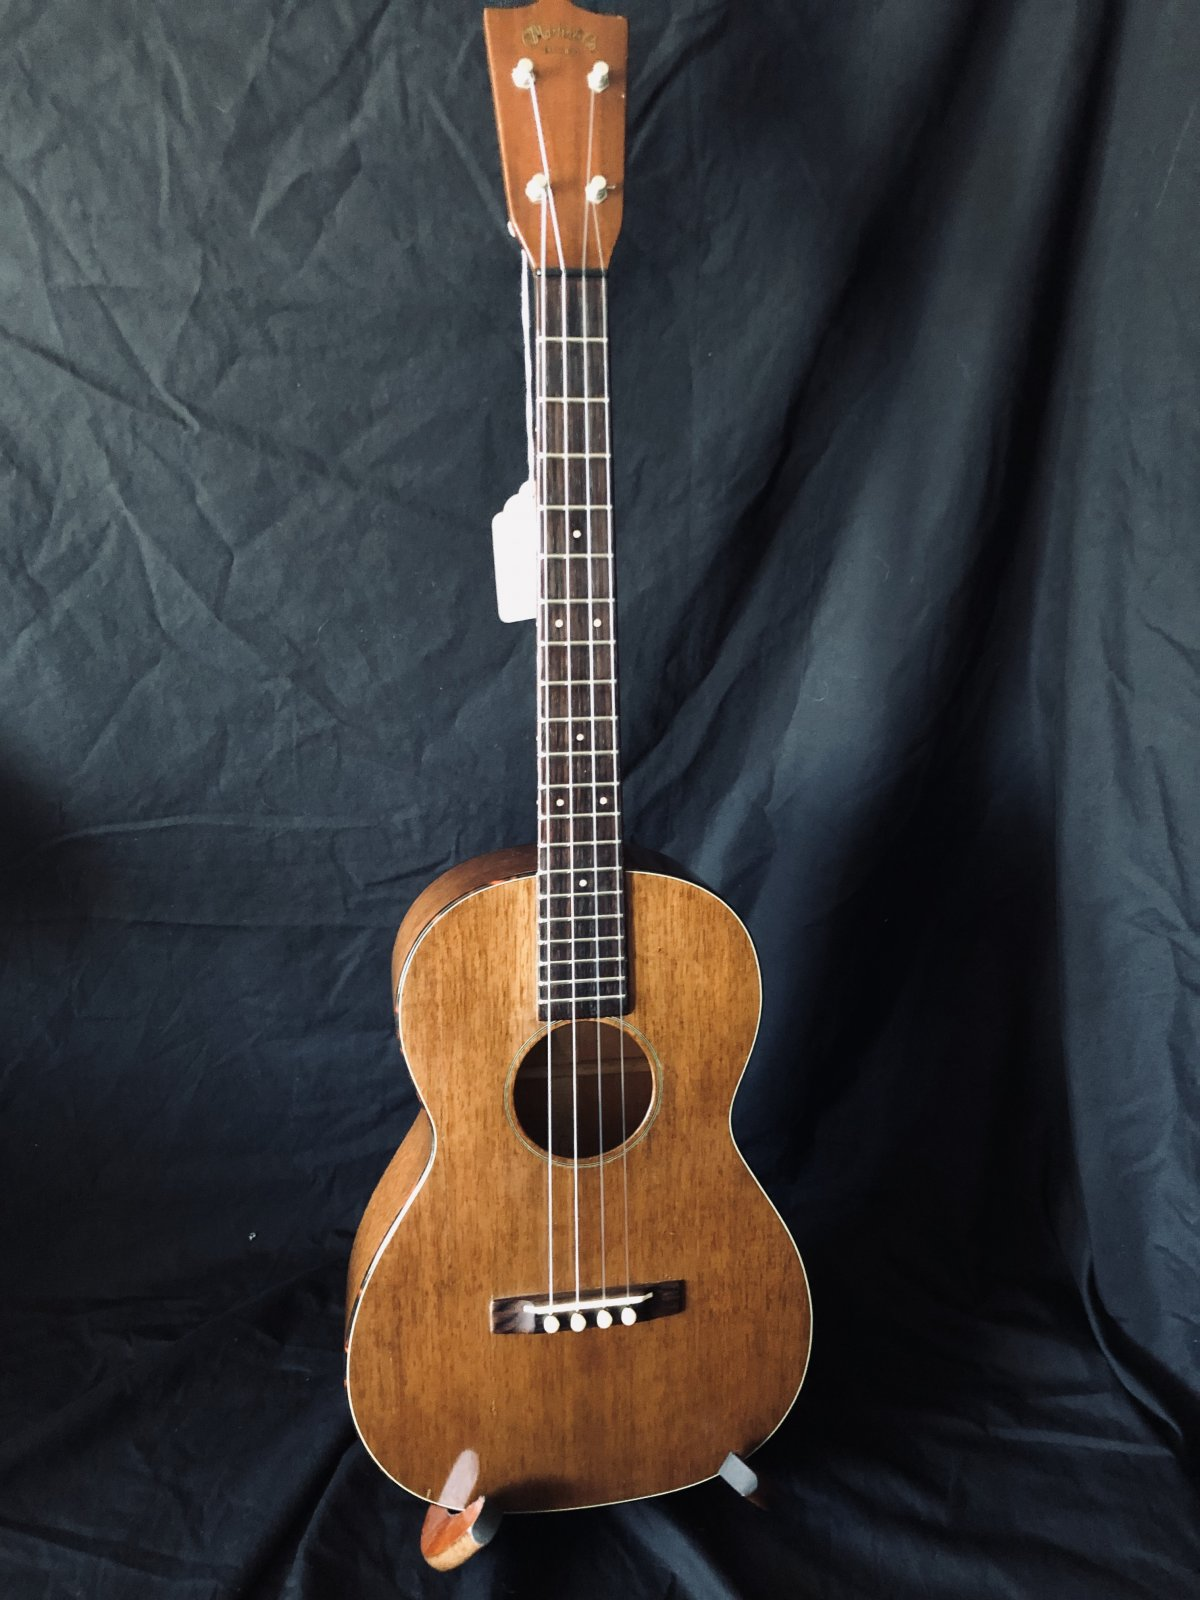 Preowned 1960's Martin B51 Baritone Ukulele w/Chipboard Case